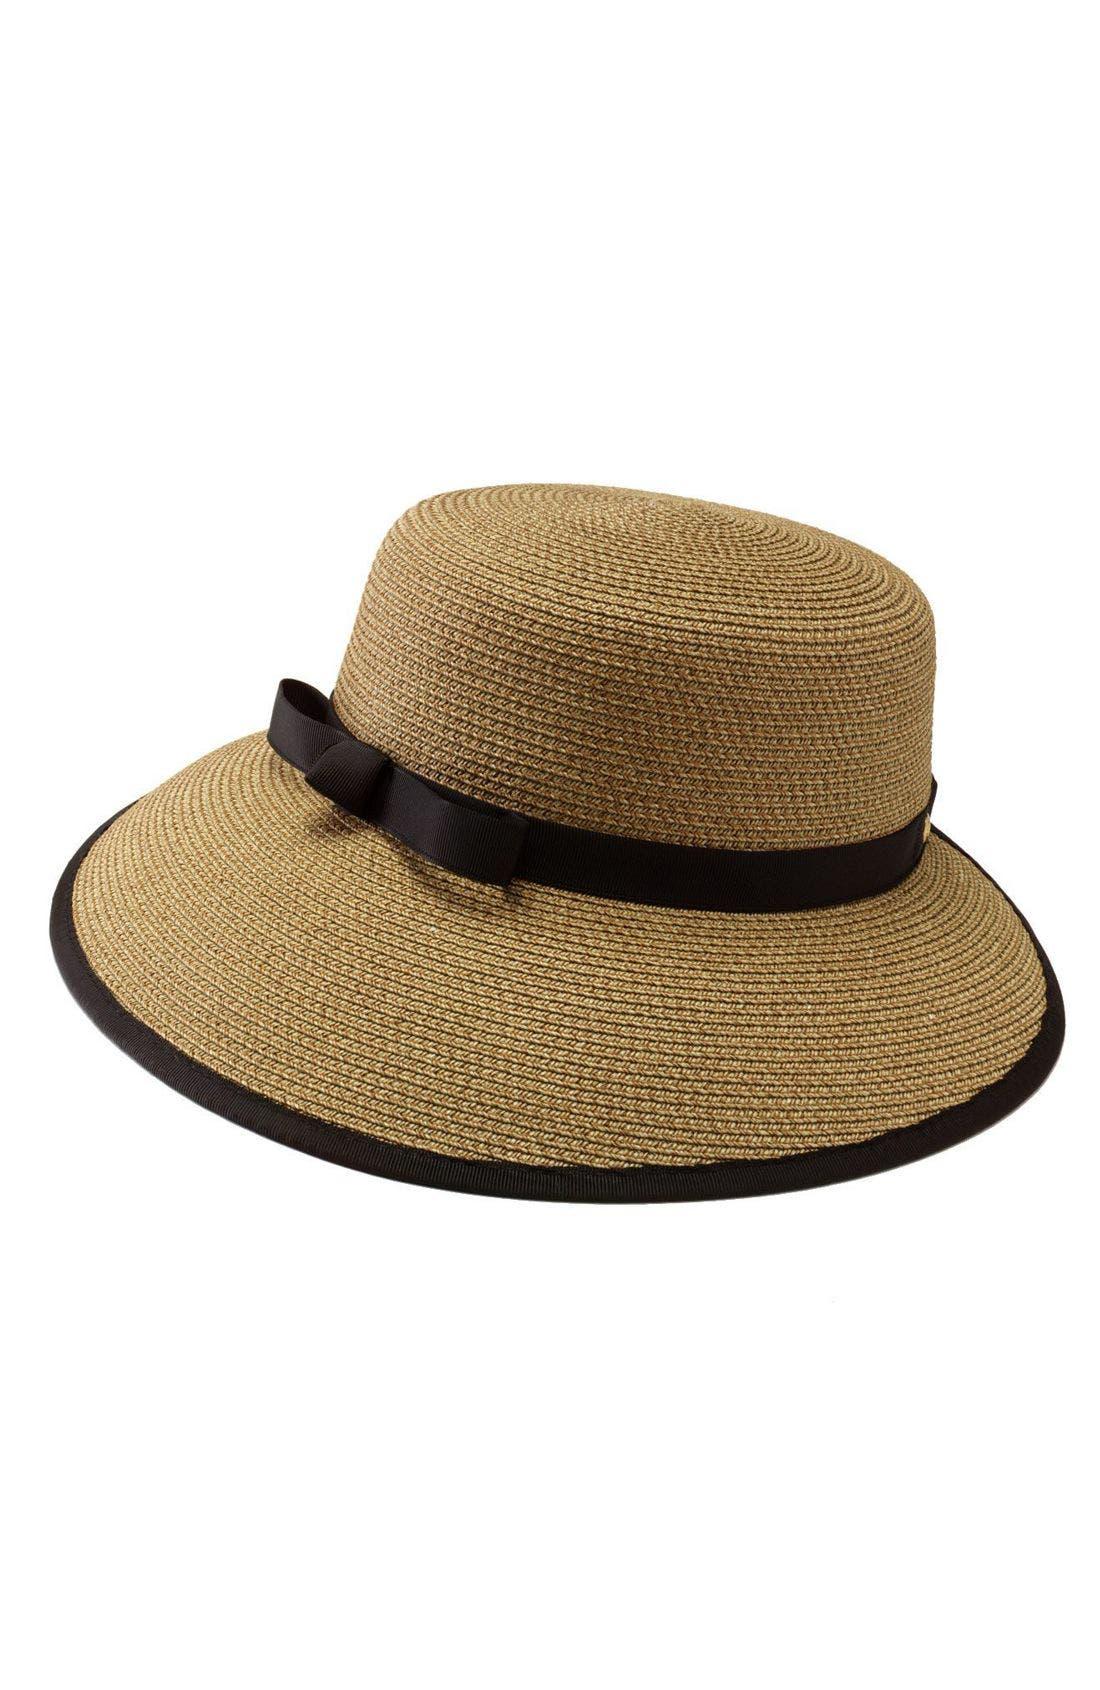 Squishee<sup>®</sup> Straw Cap,                             Main thumbnail 1, color,                             Natural/Black